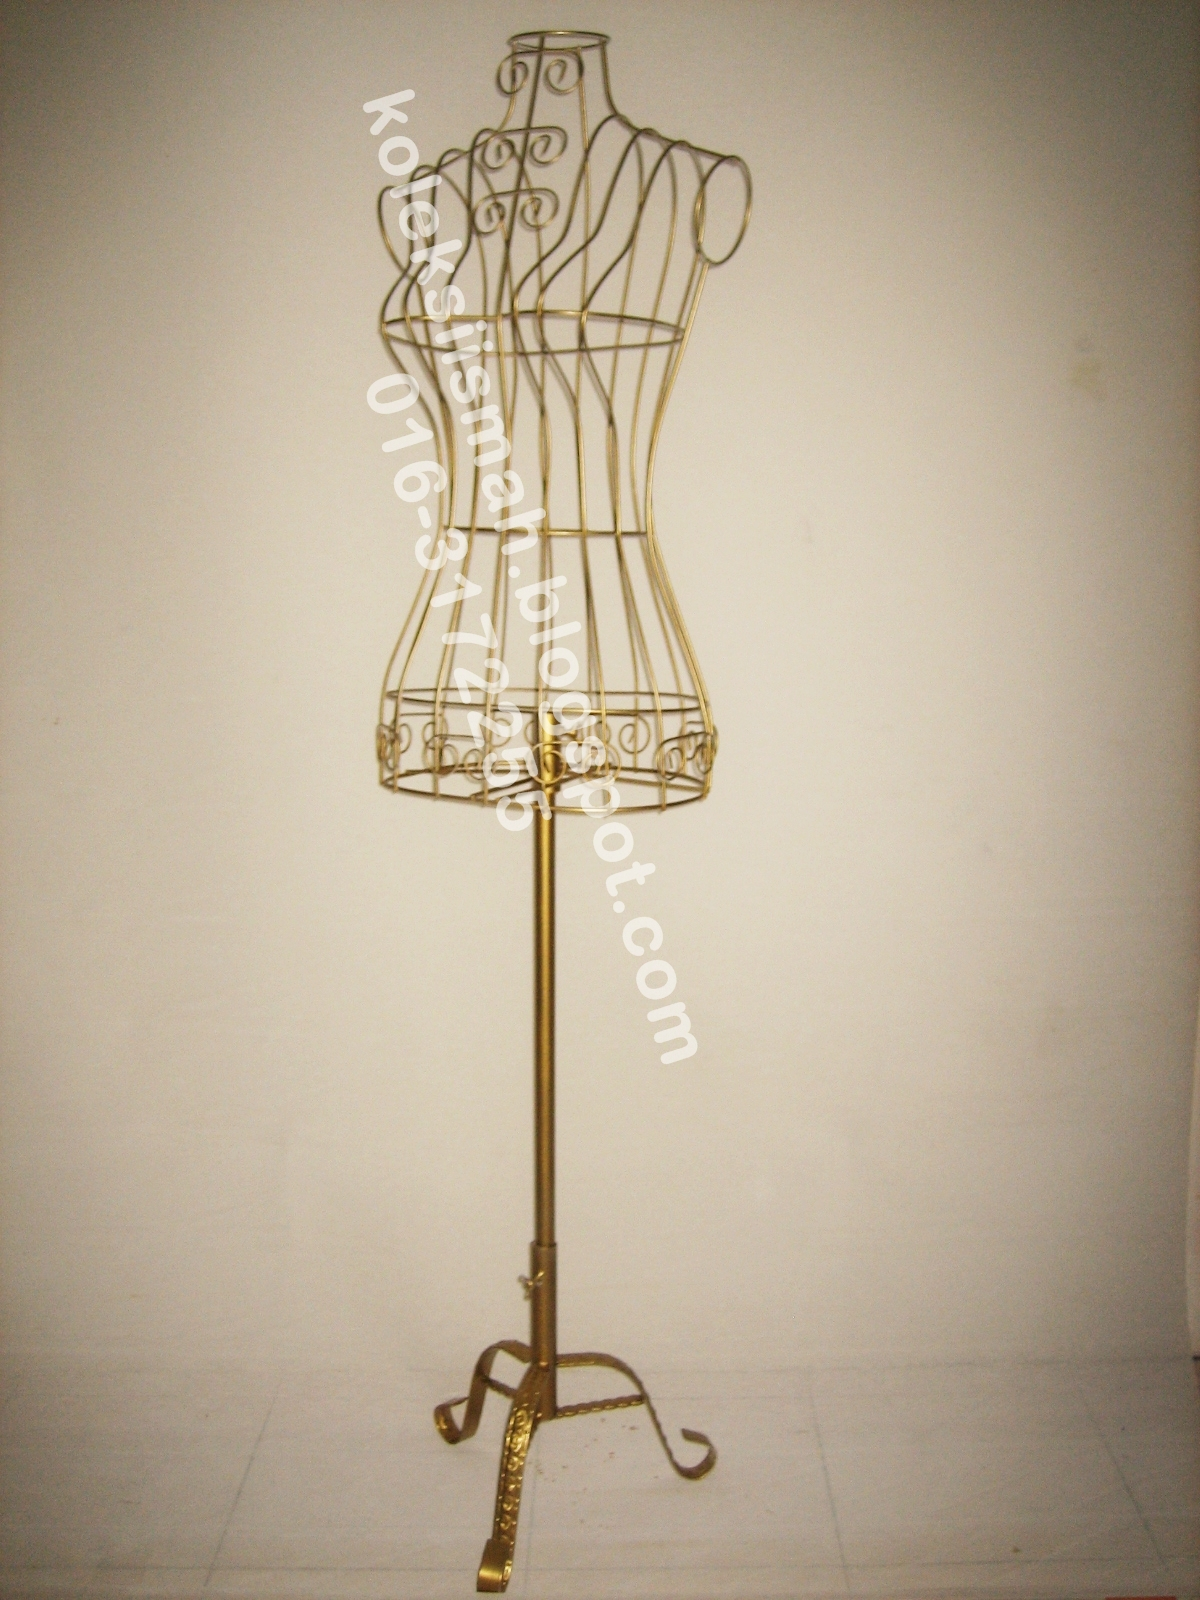 Unique Mannequin Wire Adornment - Wiring Schematics and Diagrams ...